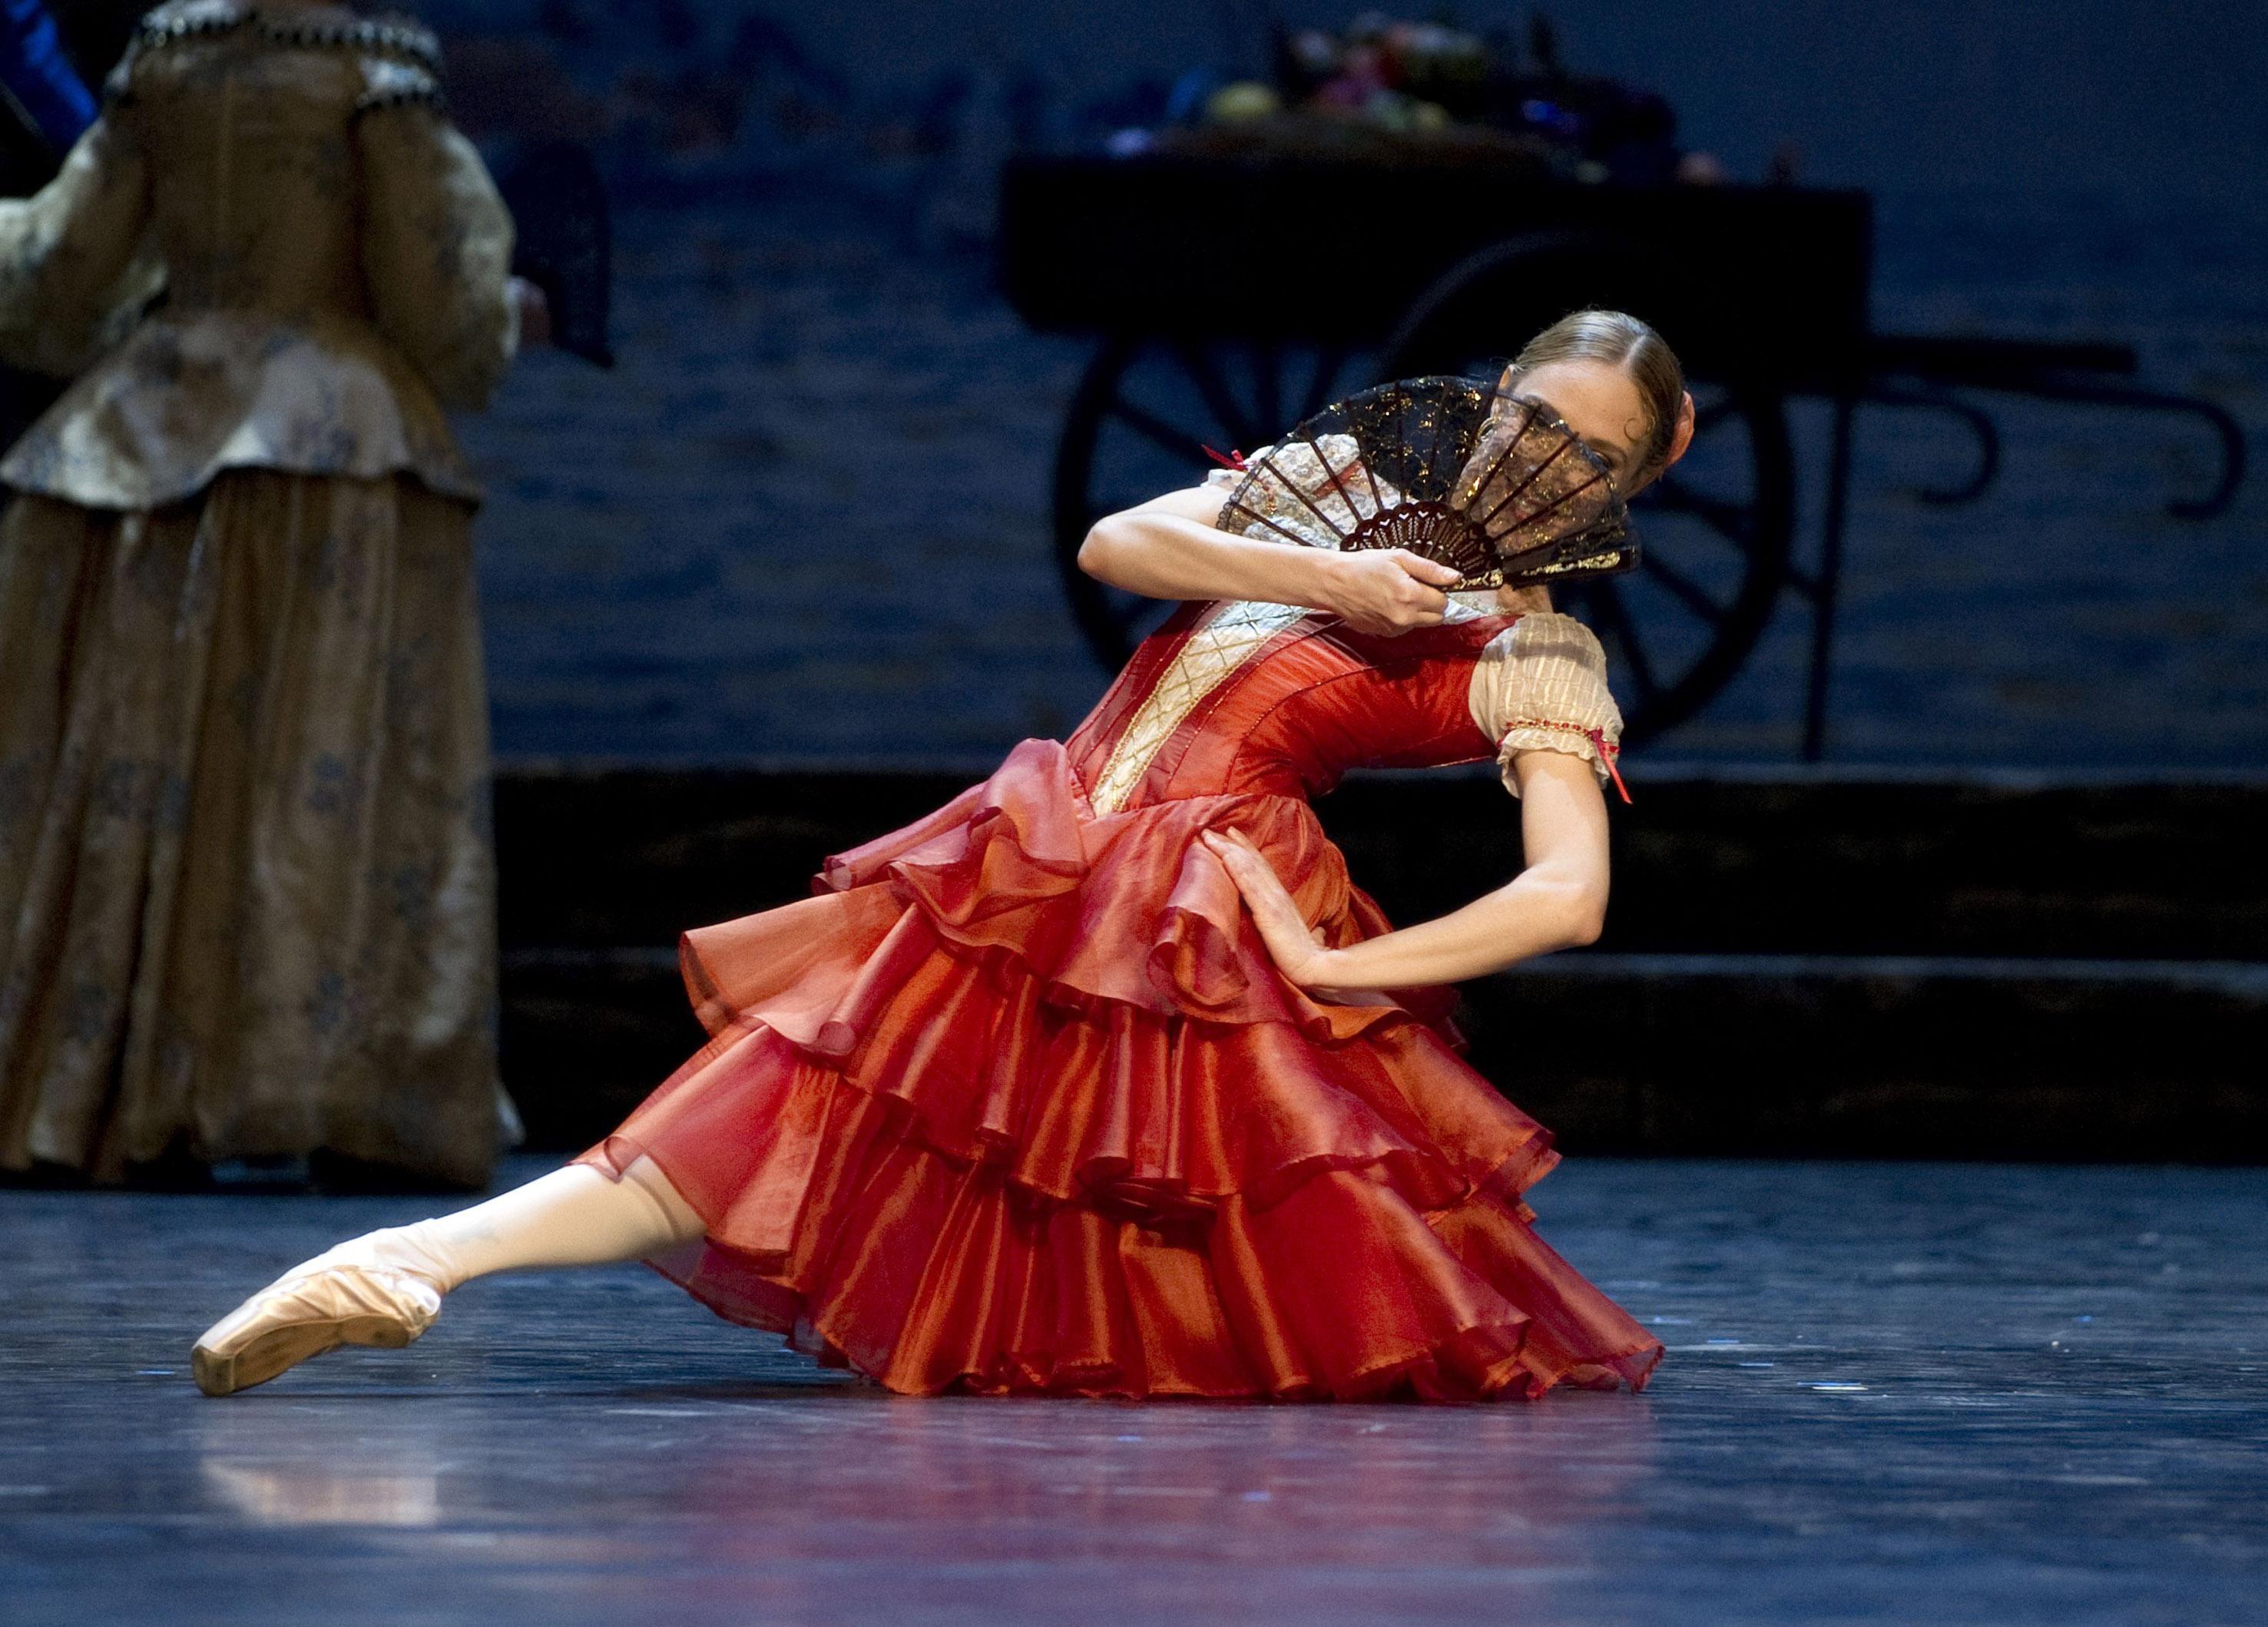 Yolanda Correa as Kitri in Don Quixote, the Norwegian National Ballet 2011